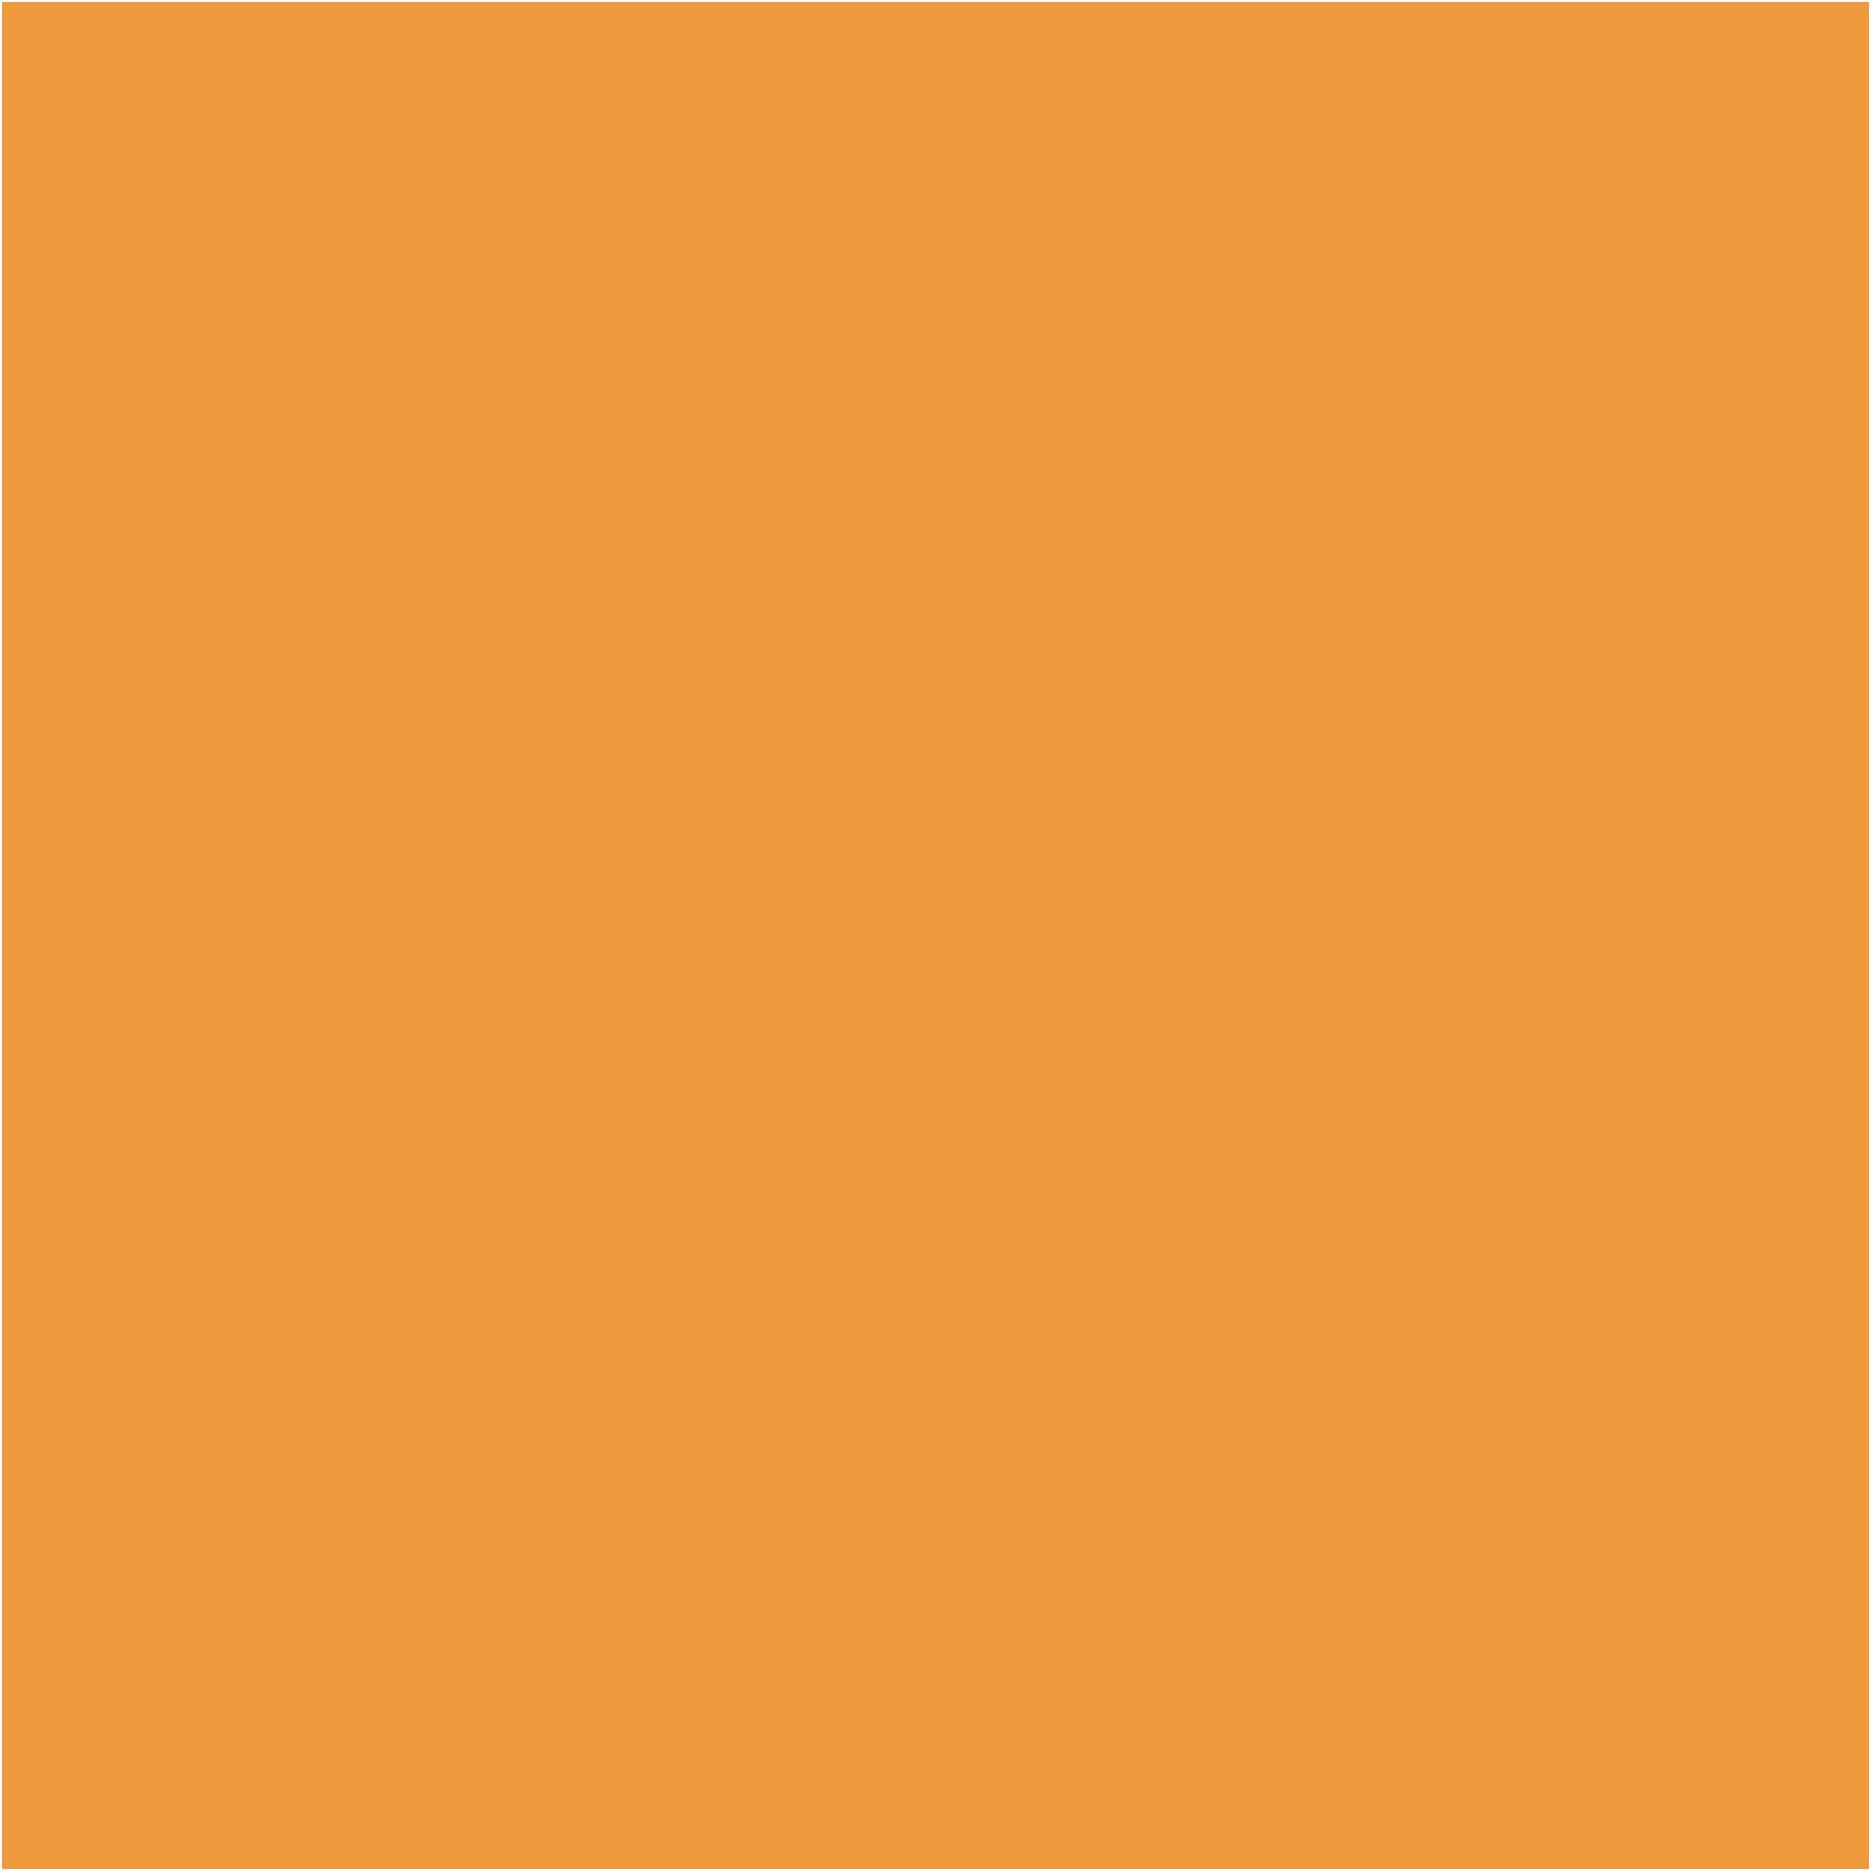 Twitter #somMontserrat